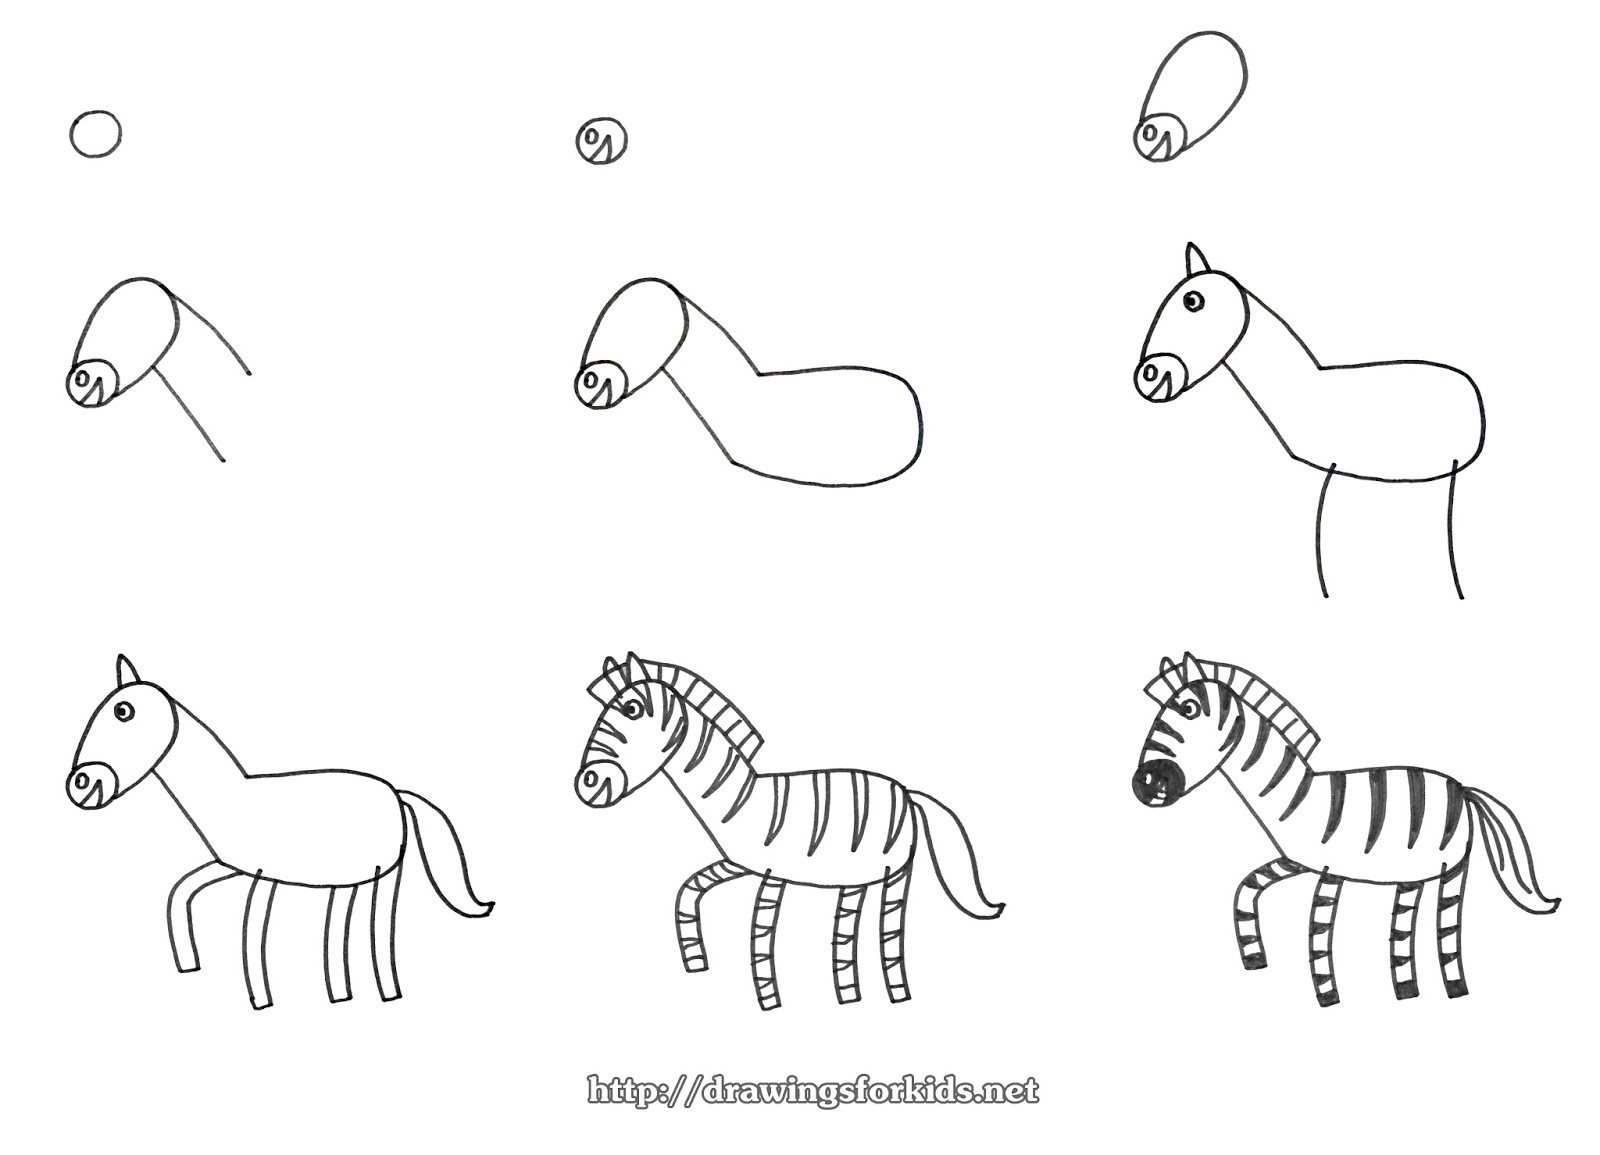 How to draw a Zebra for kids - drawingsforkids.net